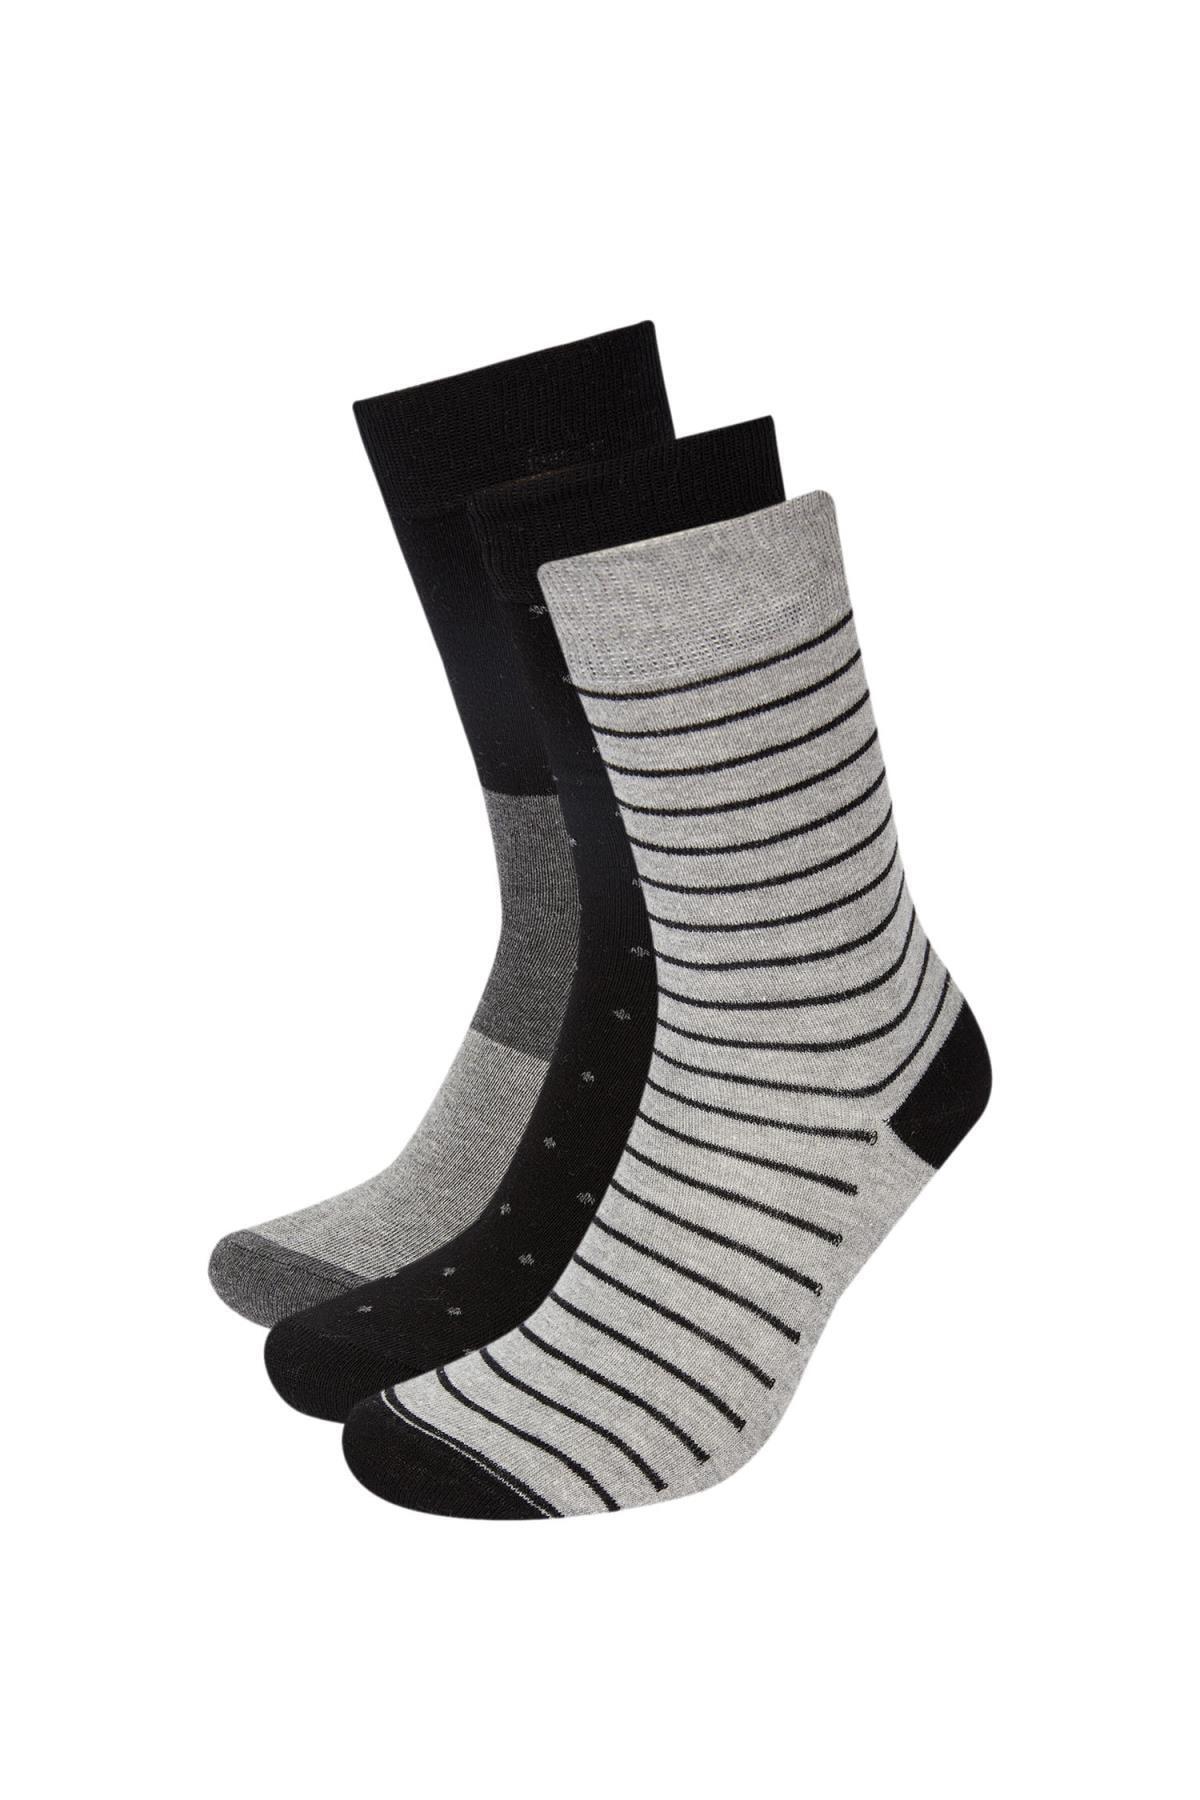 DeFacto Erkek Pamuklu 3'lü Soket Çorap